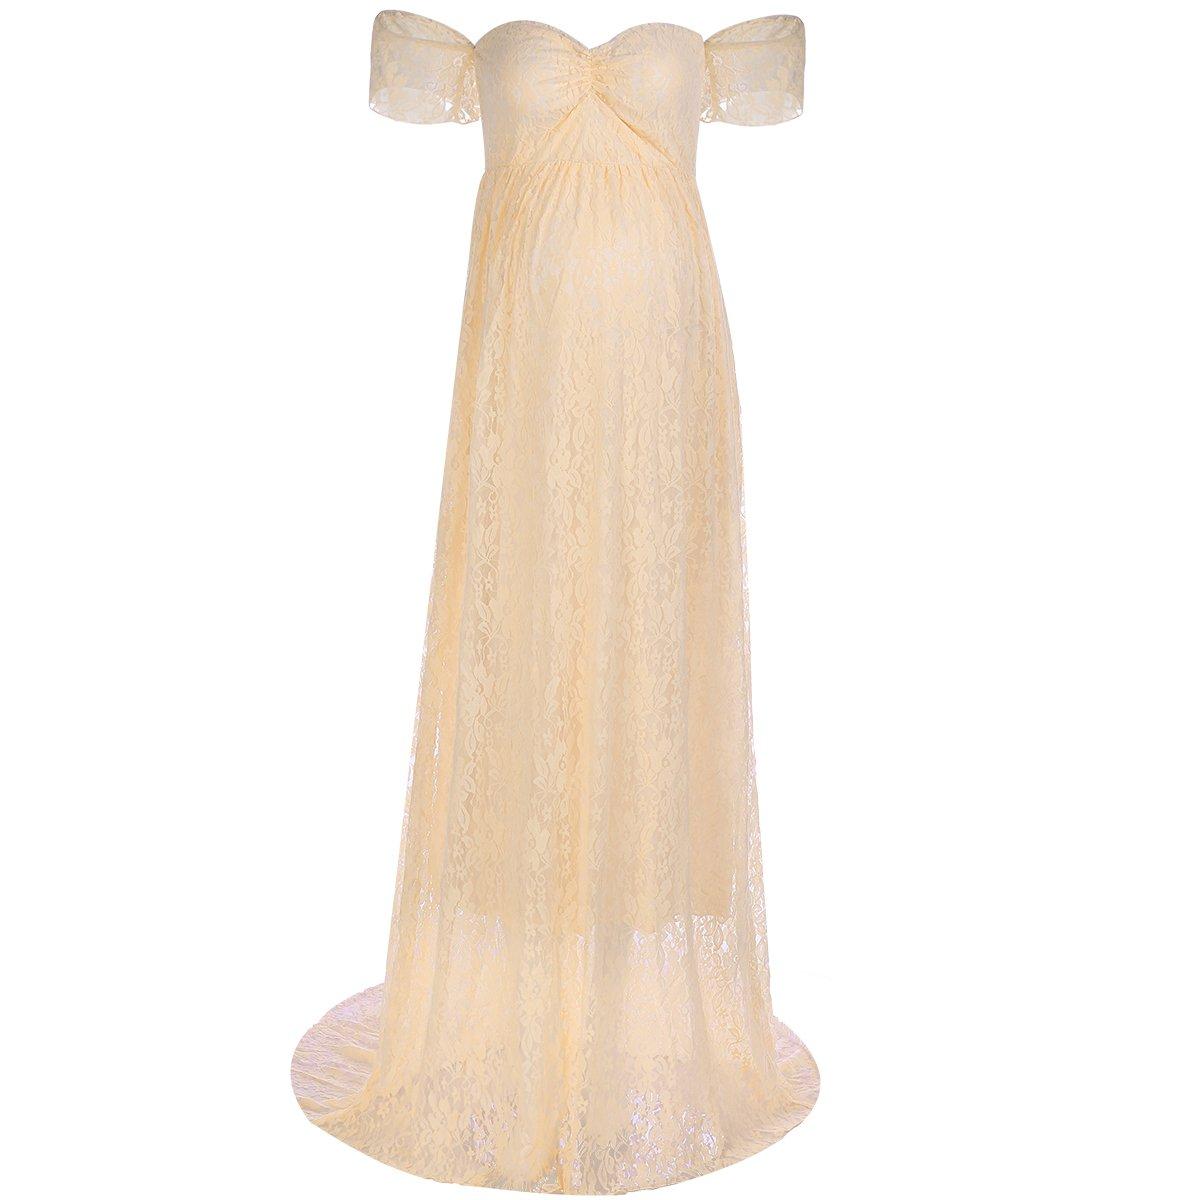 IBTOM CASTLE DRESS レディース B076JB2KY5 S|Apricot Yellow Apricot Yellow S